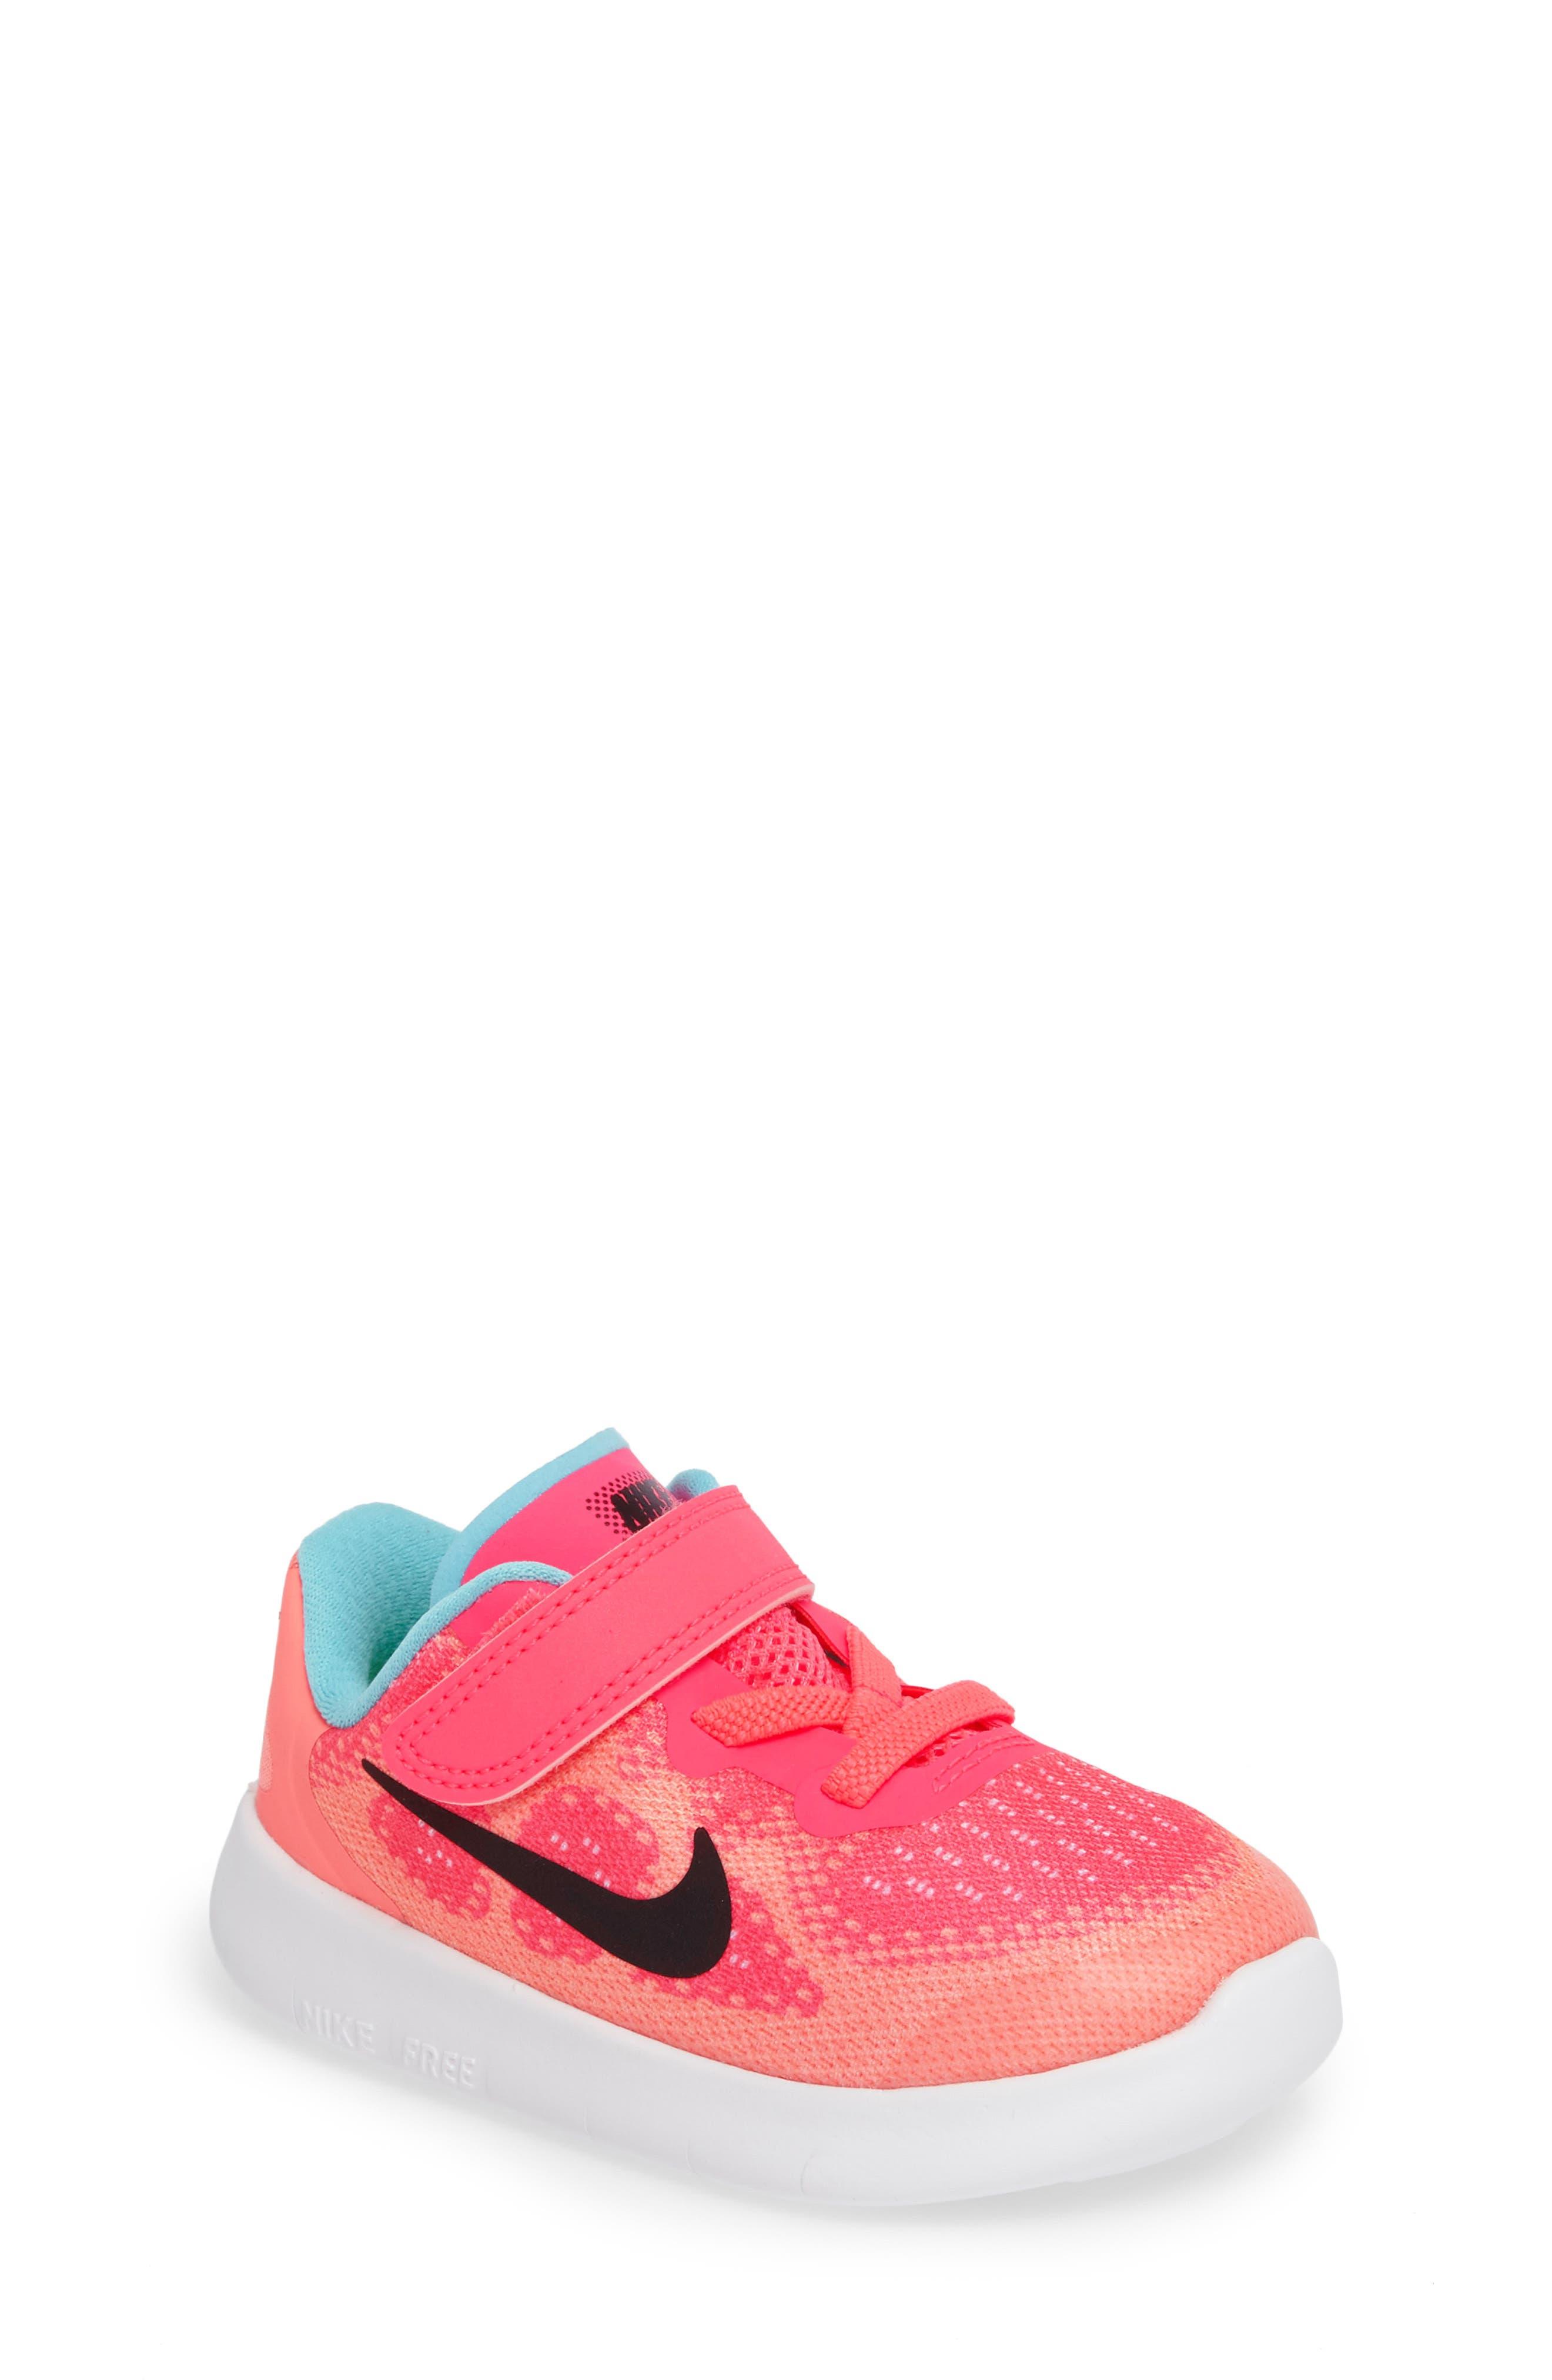 Main Image - Nike Free Run 2017 Sneaker (Baby, Walker, Toddler & Little Kid)